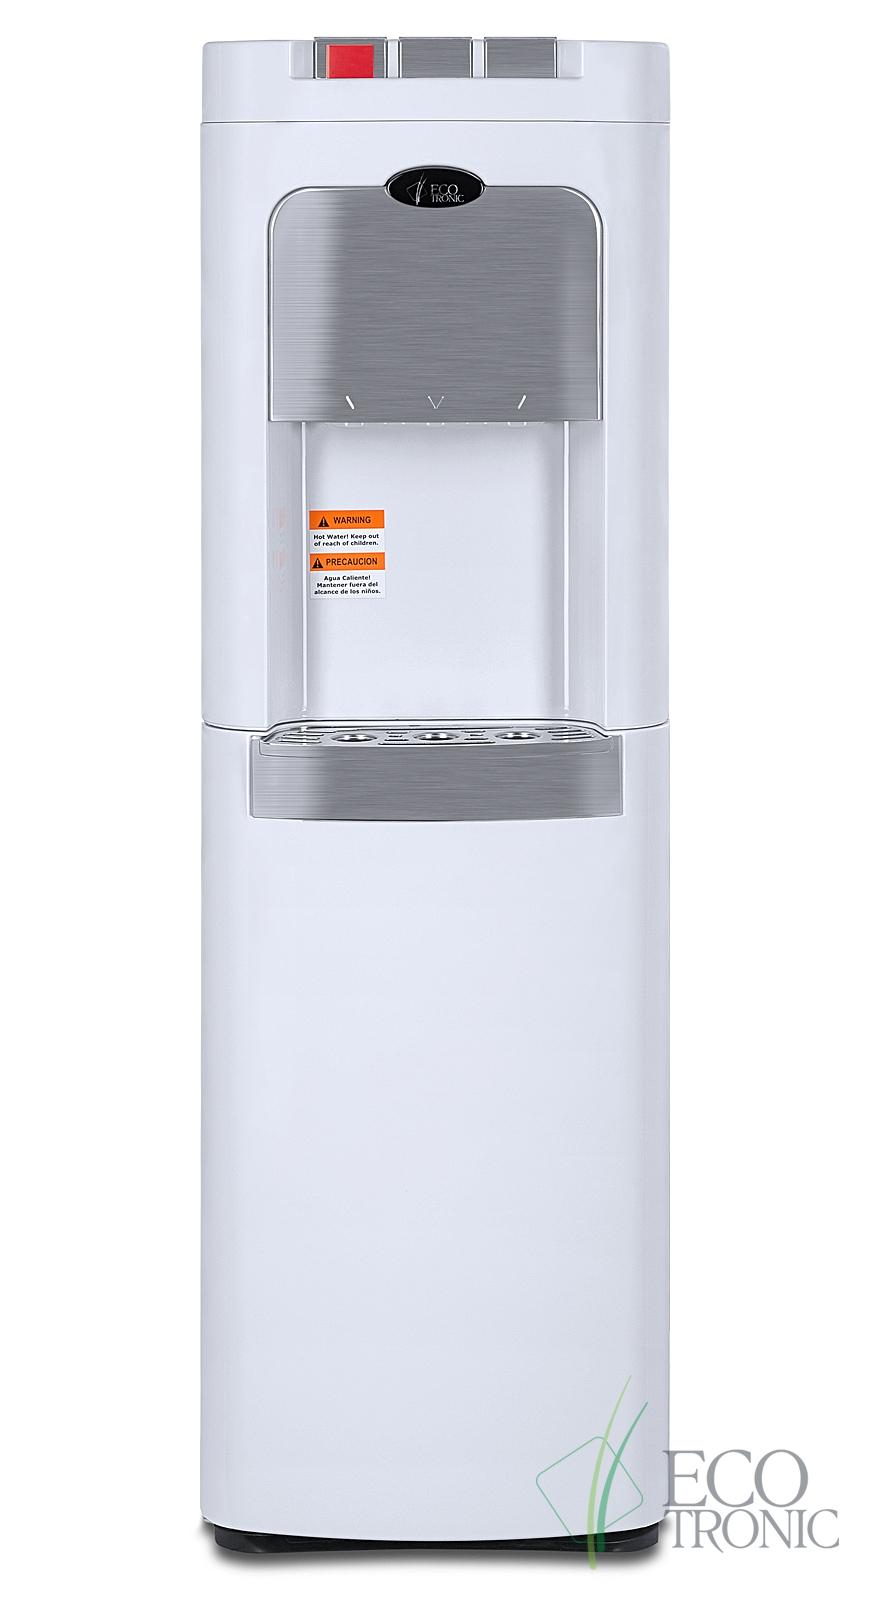 Кулер Ecotronic C8-LX white с нижней загрузкой бутыли